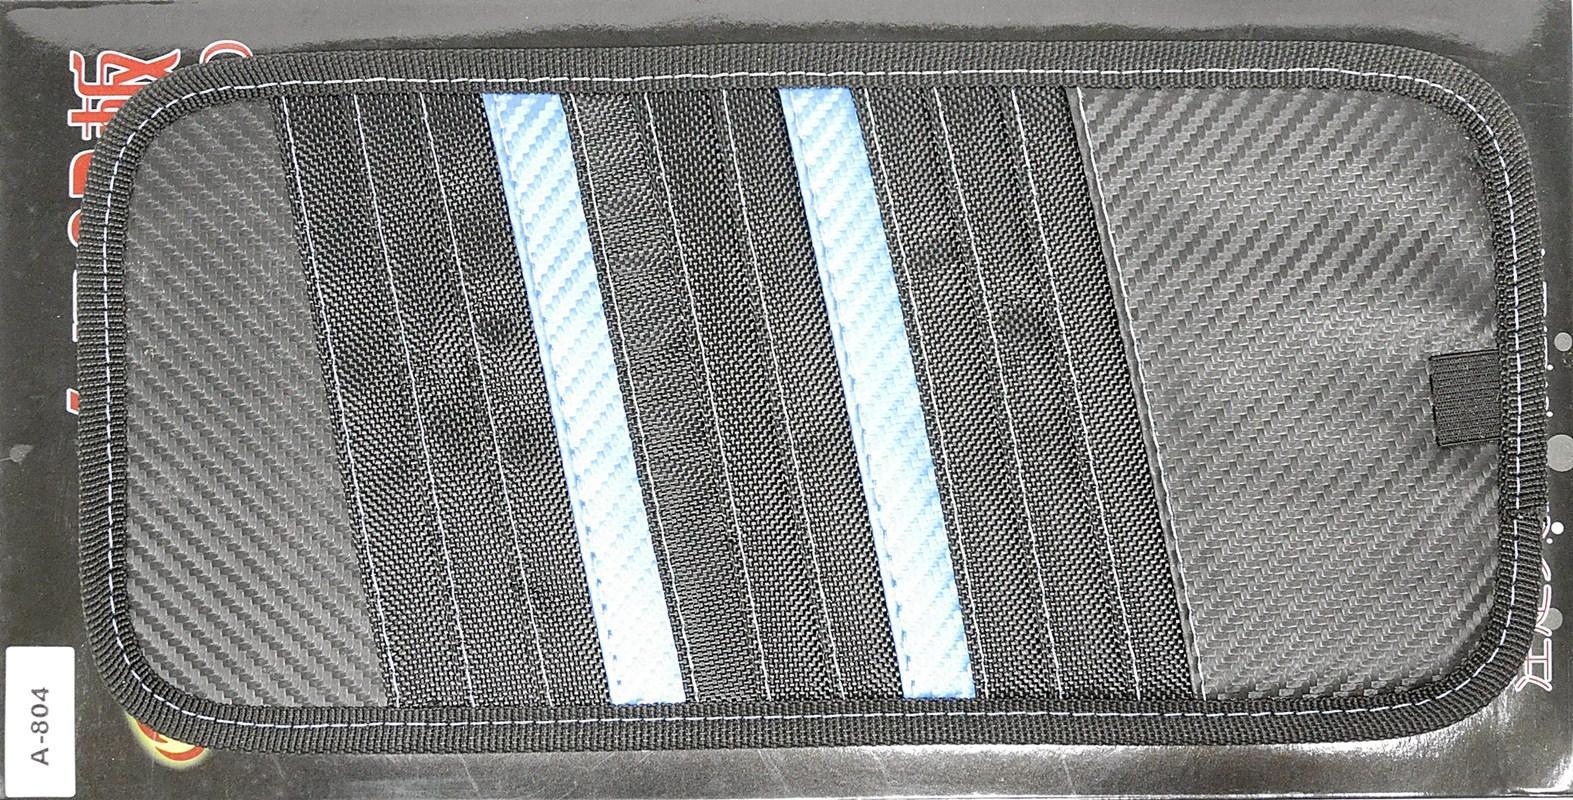 SIV A-804 Carbon CD Board Organizer and Sunvisor Mobil - Blue Black